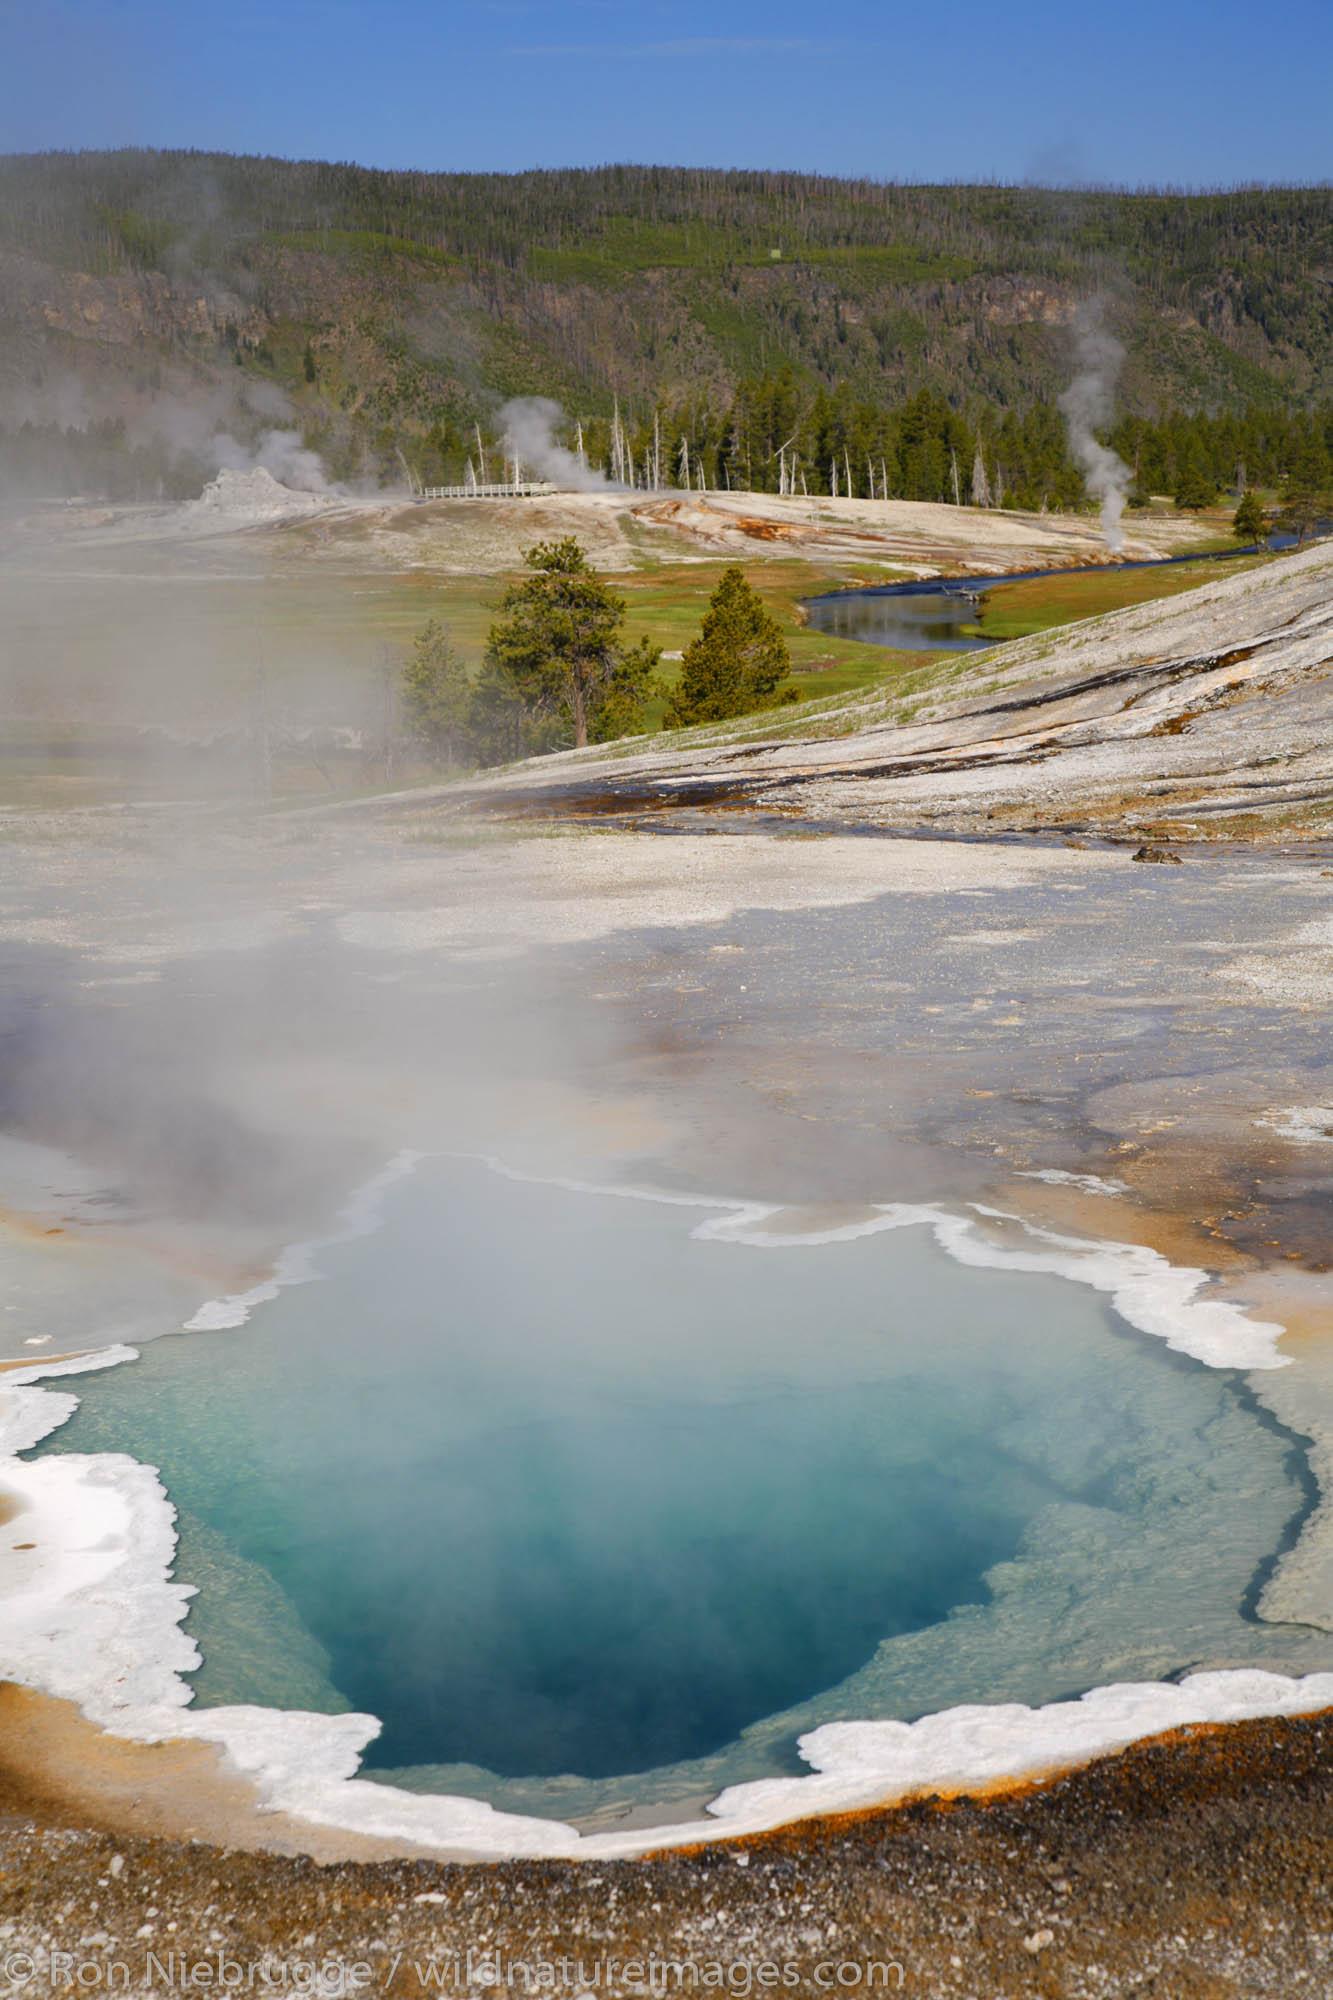 Heart Spring, Upper Geyser Basin, Yellowstone National Park, Wyoming.